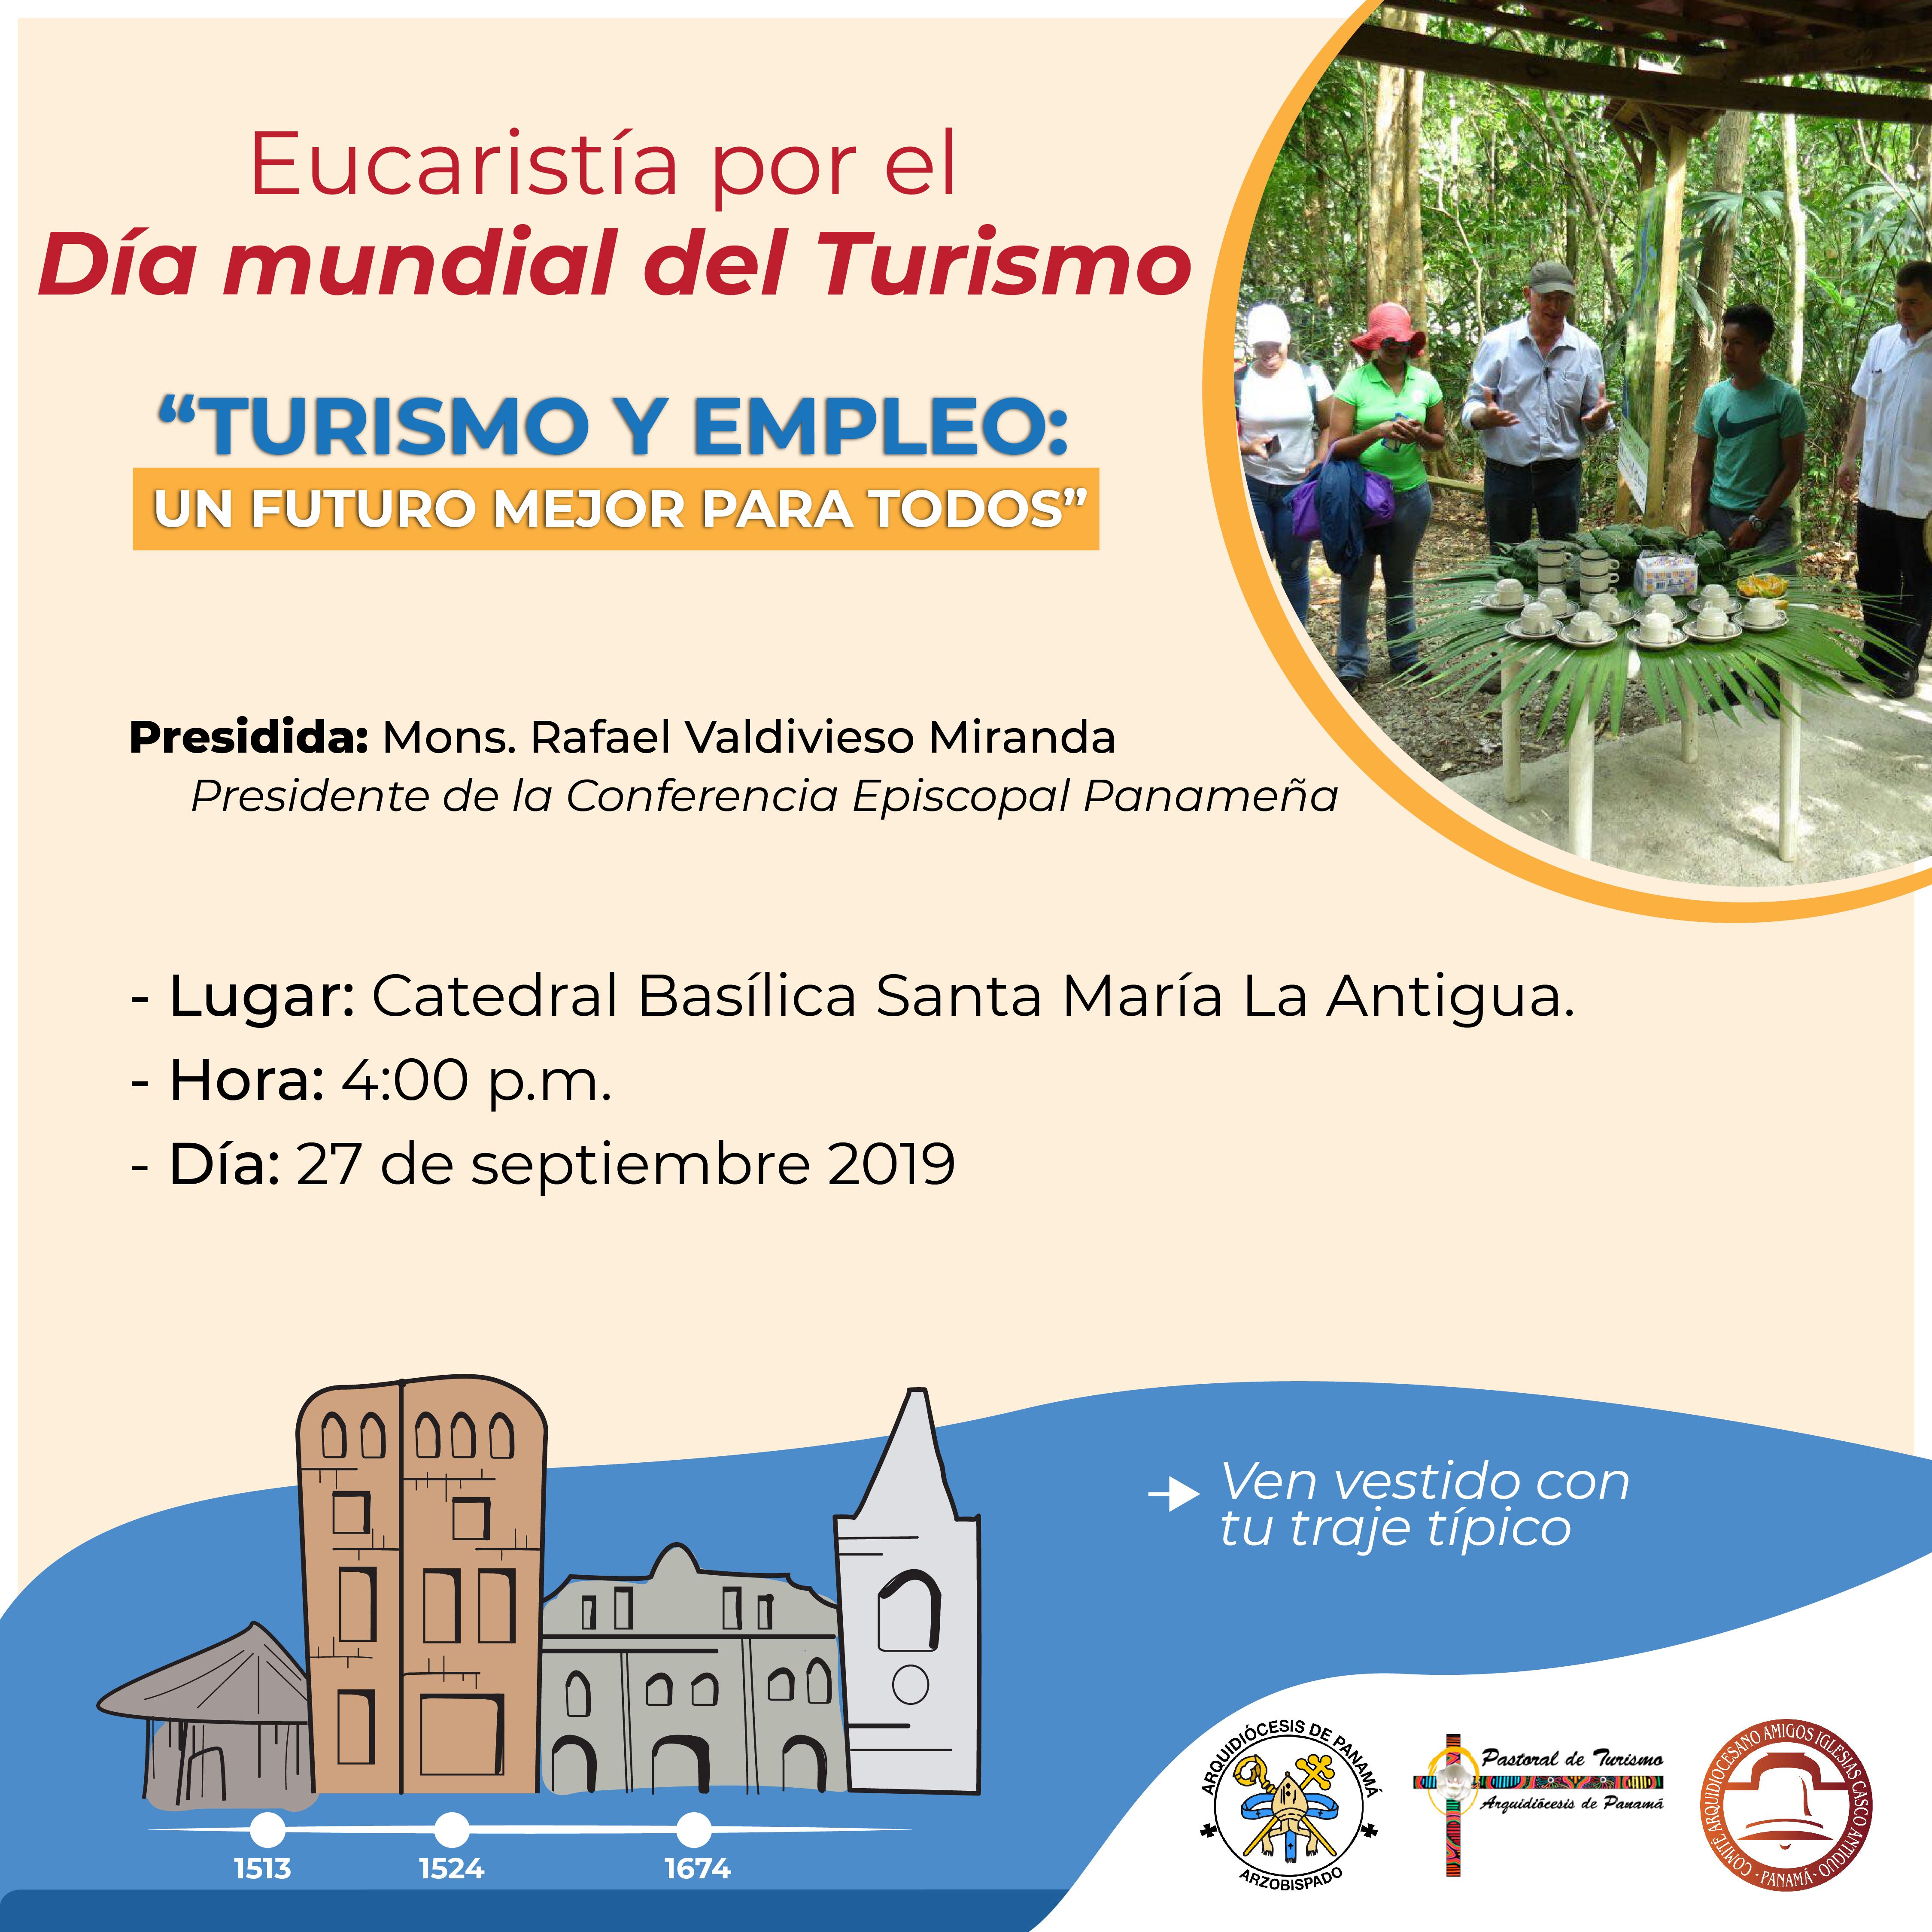 Eucaristía típica por la 39º Jornada Mundial del Turismo